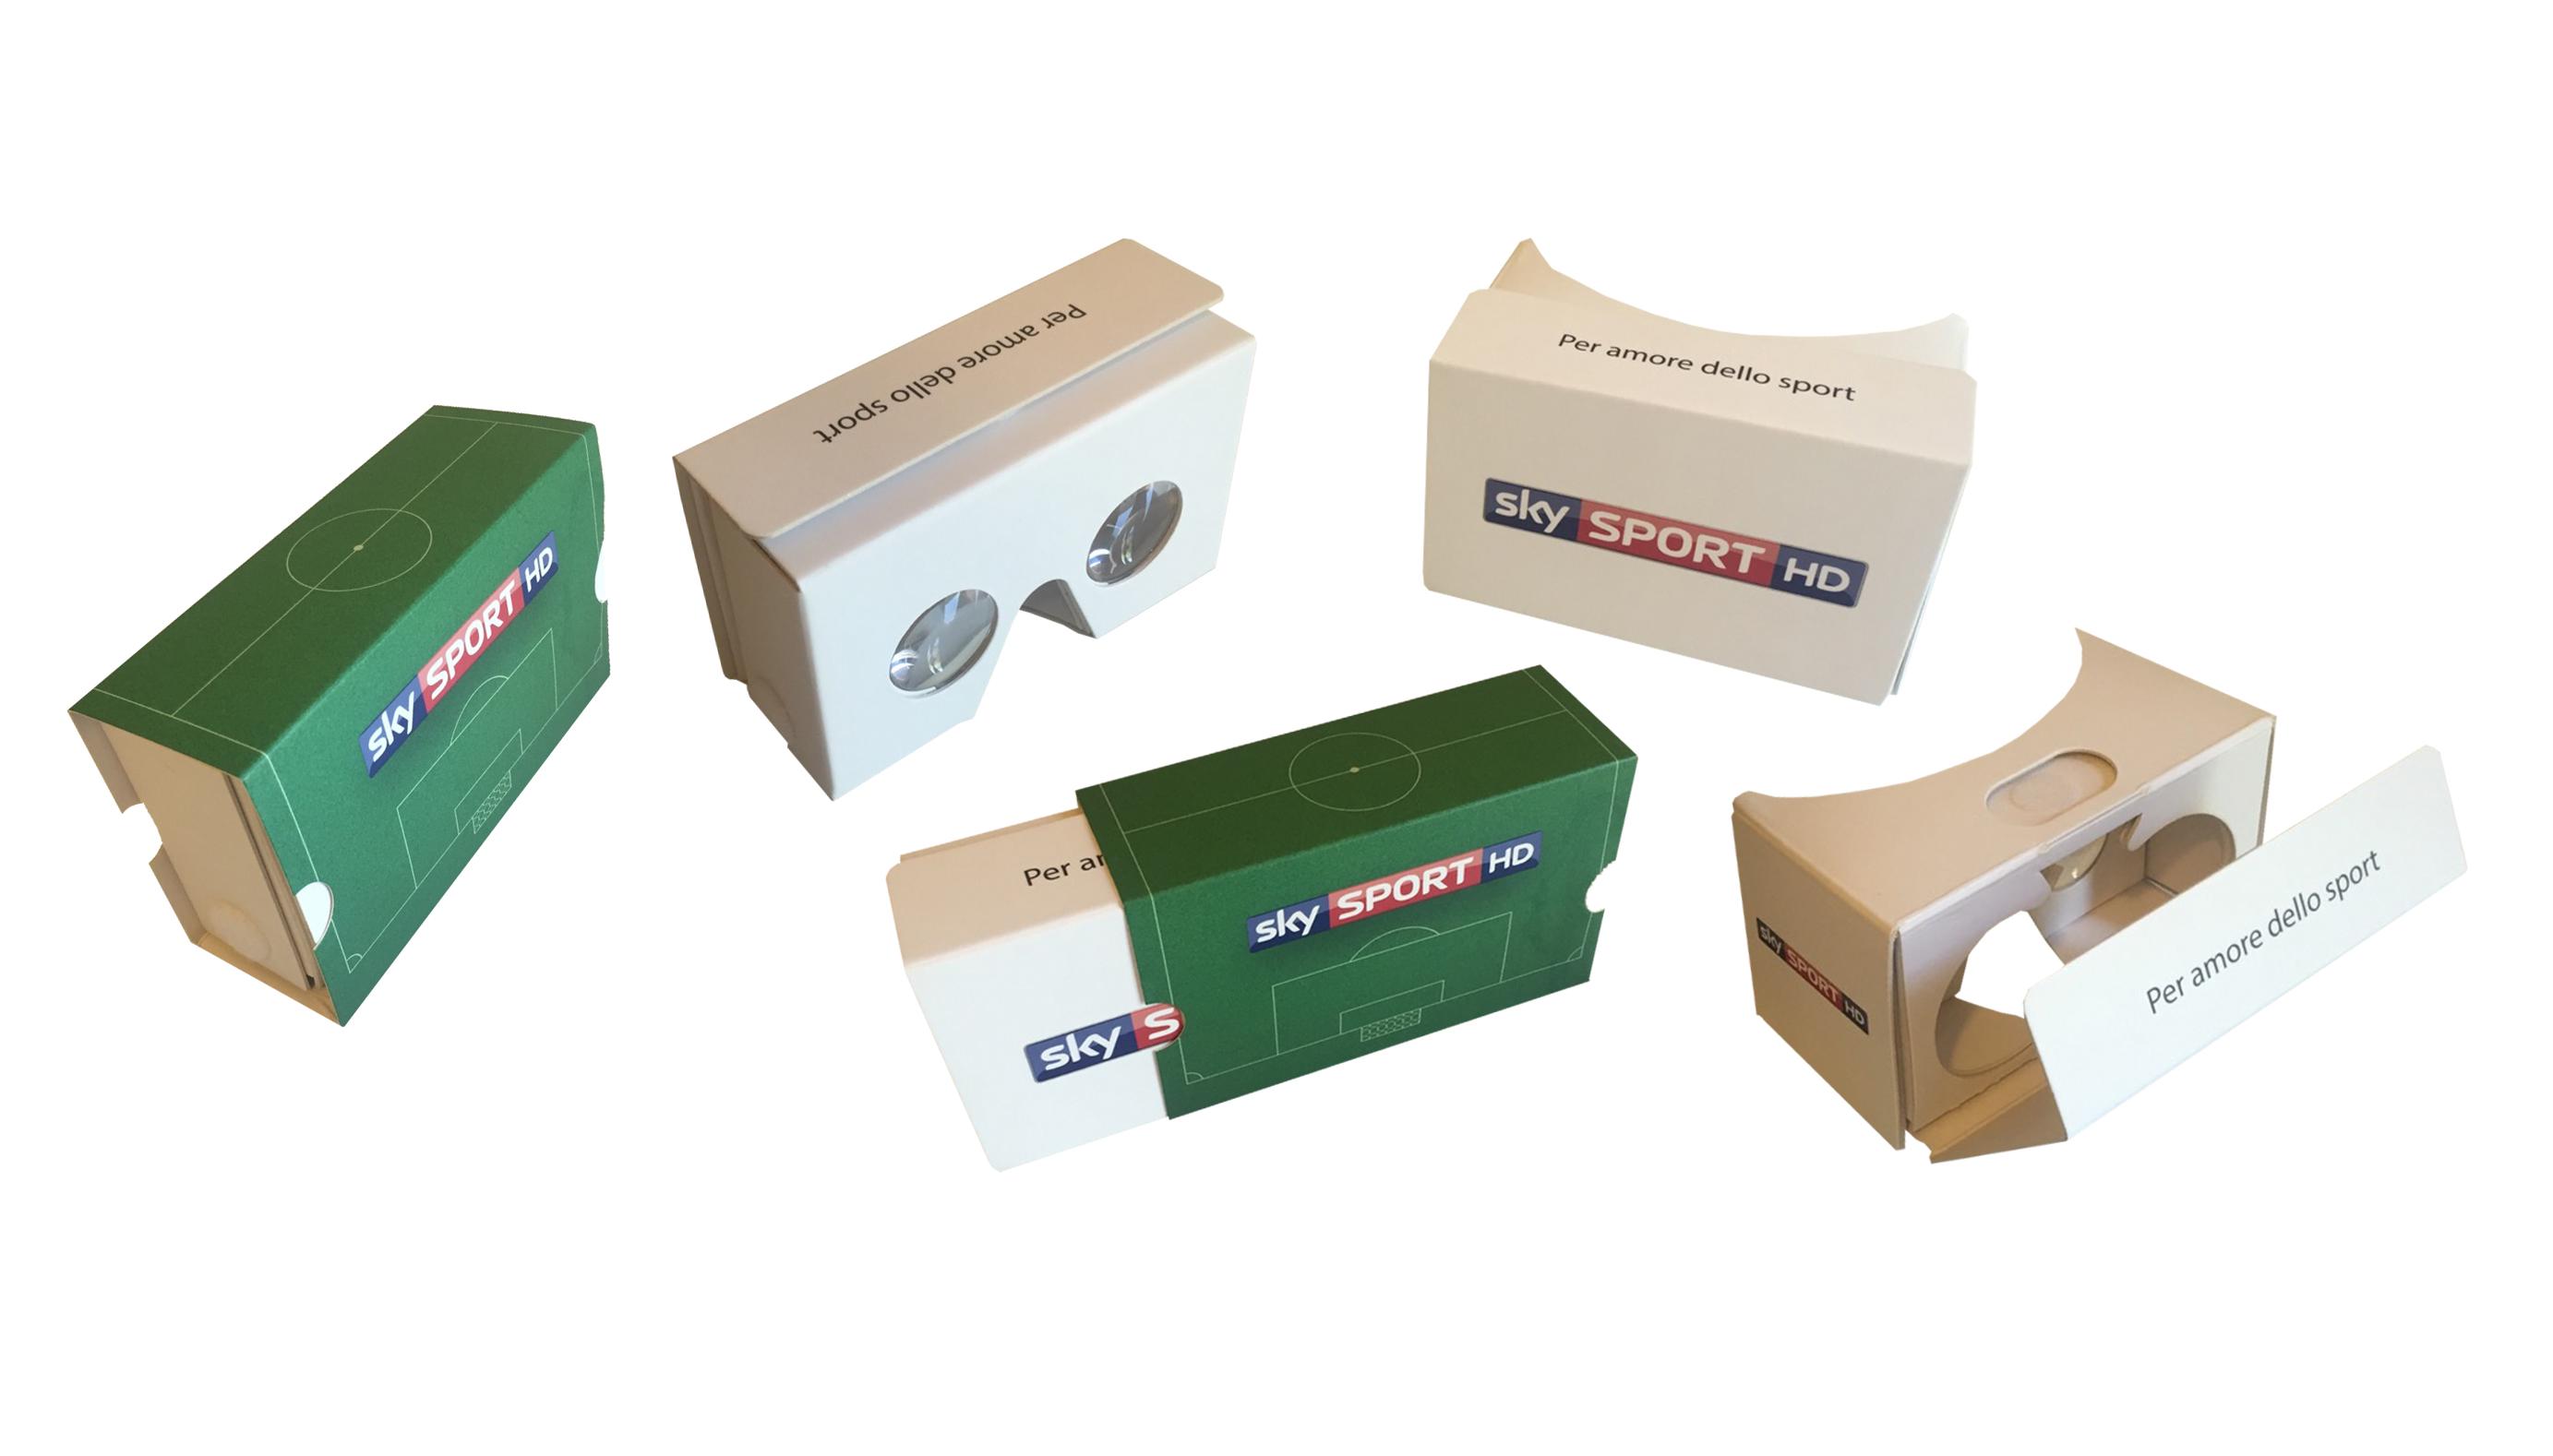 cardboard baratas V2 cartón